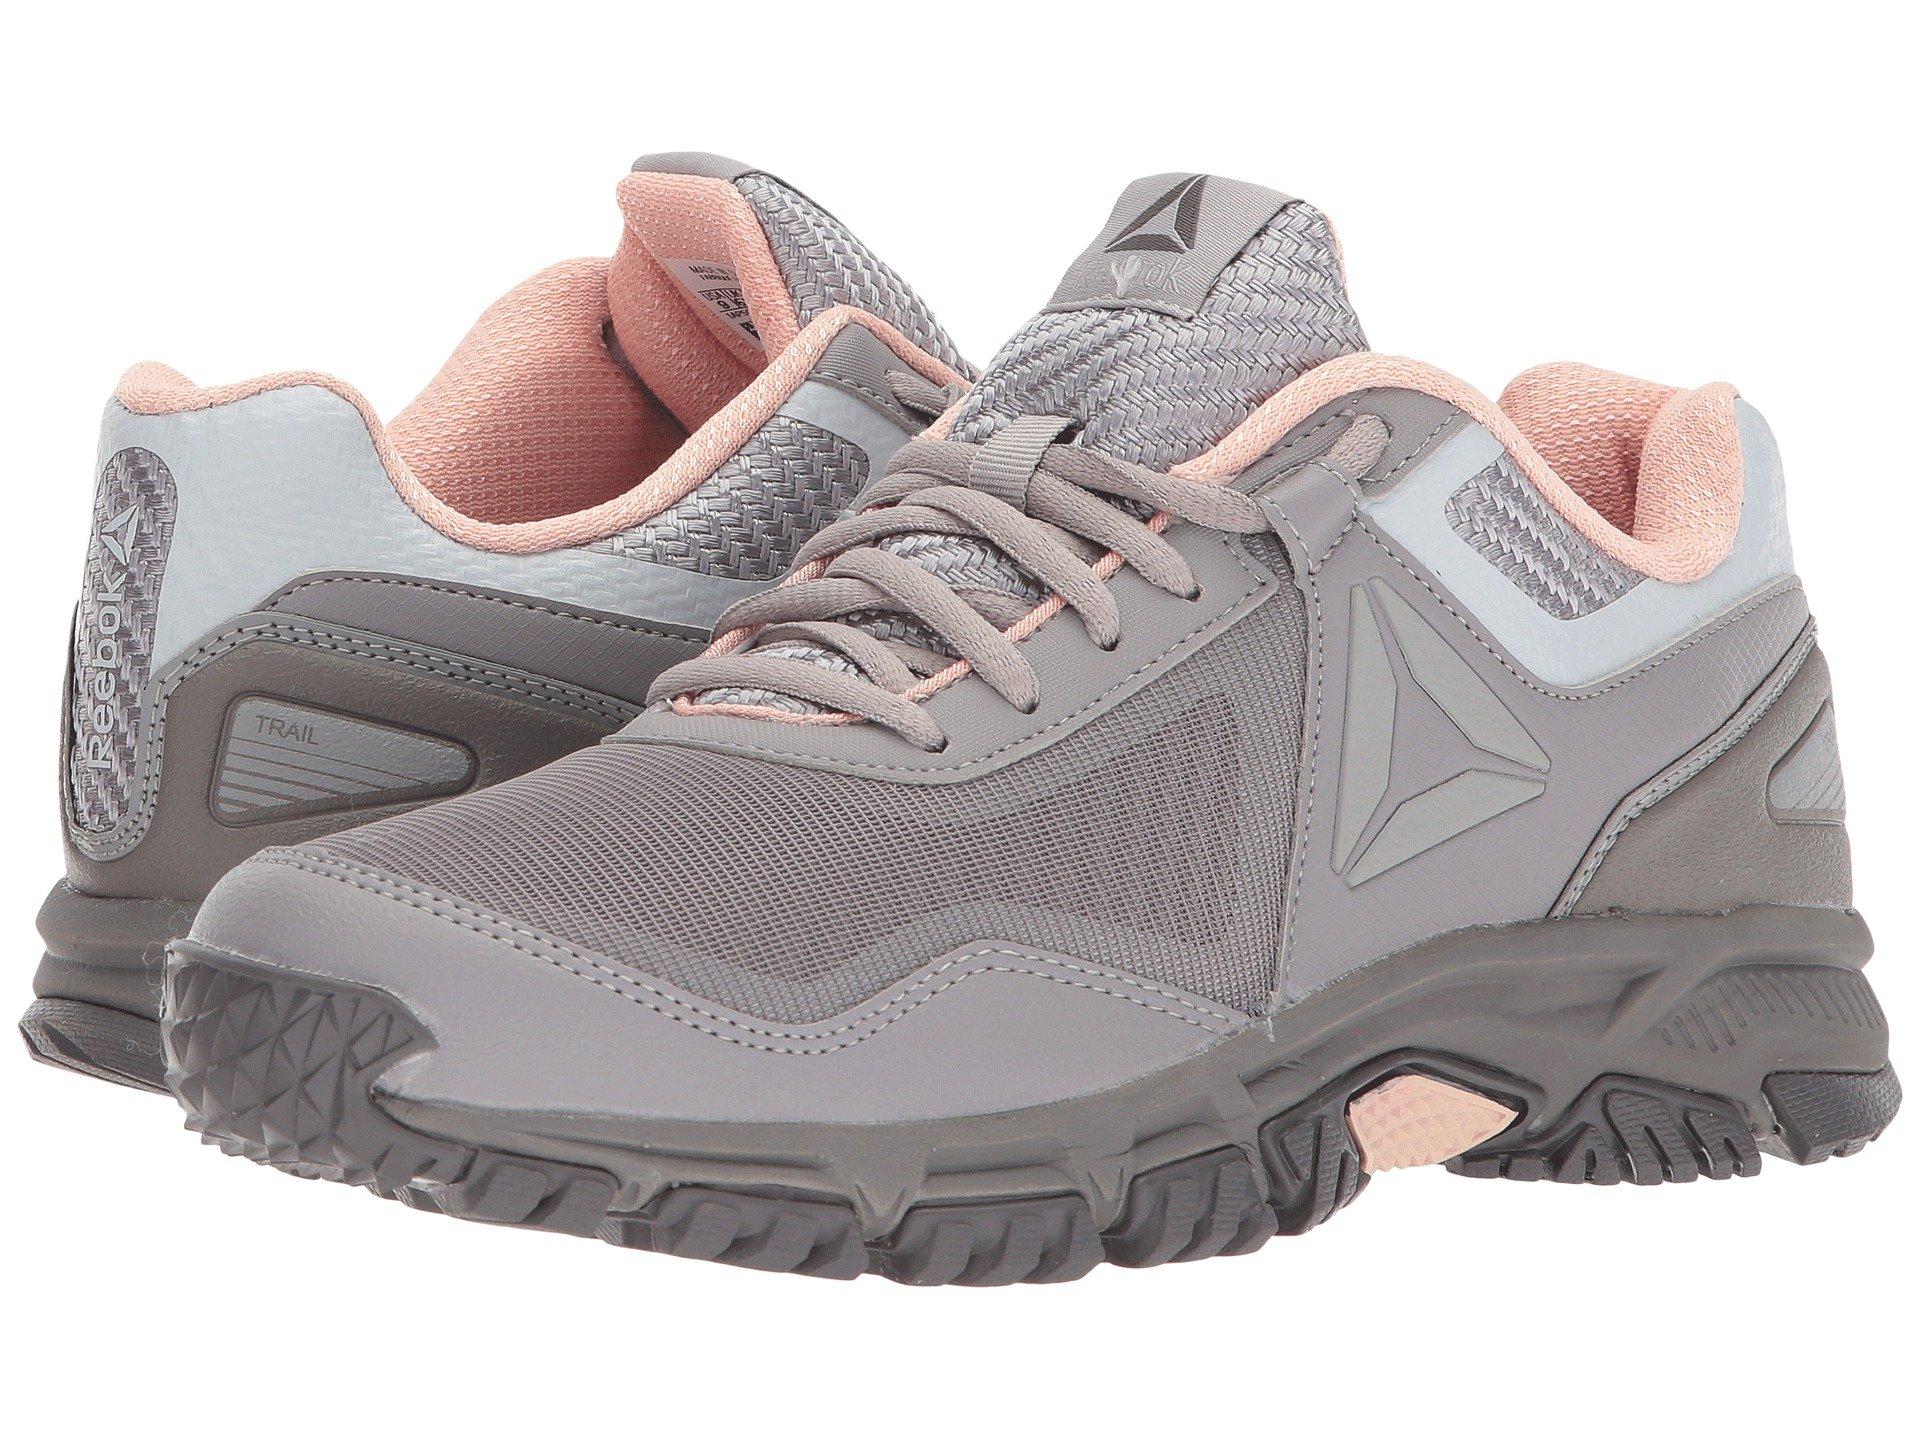 ReebokRIDGERIDER TRAIL 3.0 - Trail running shoes - blue/black/tin grey 69rI6wt